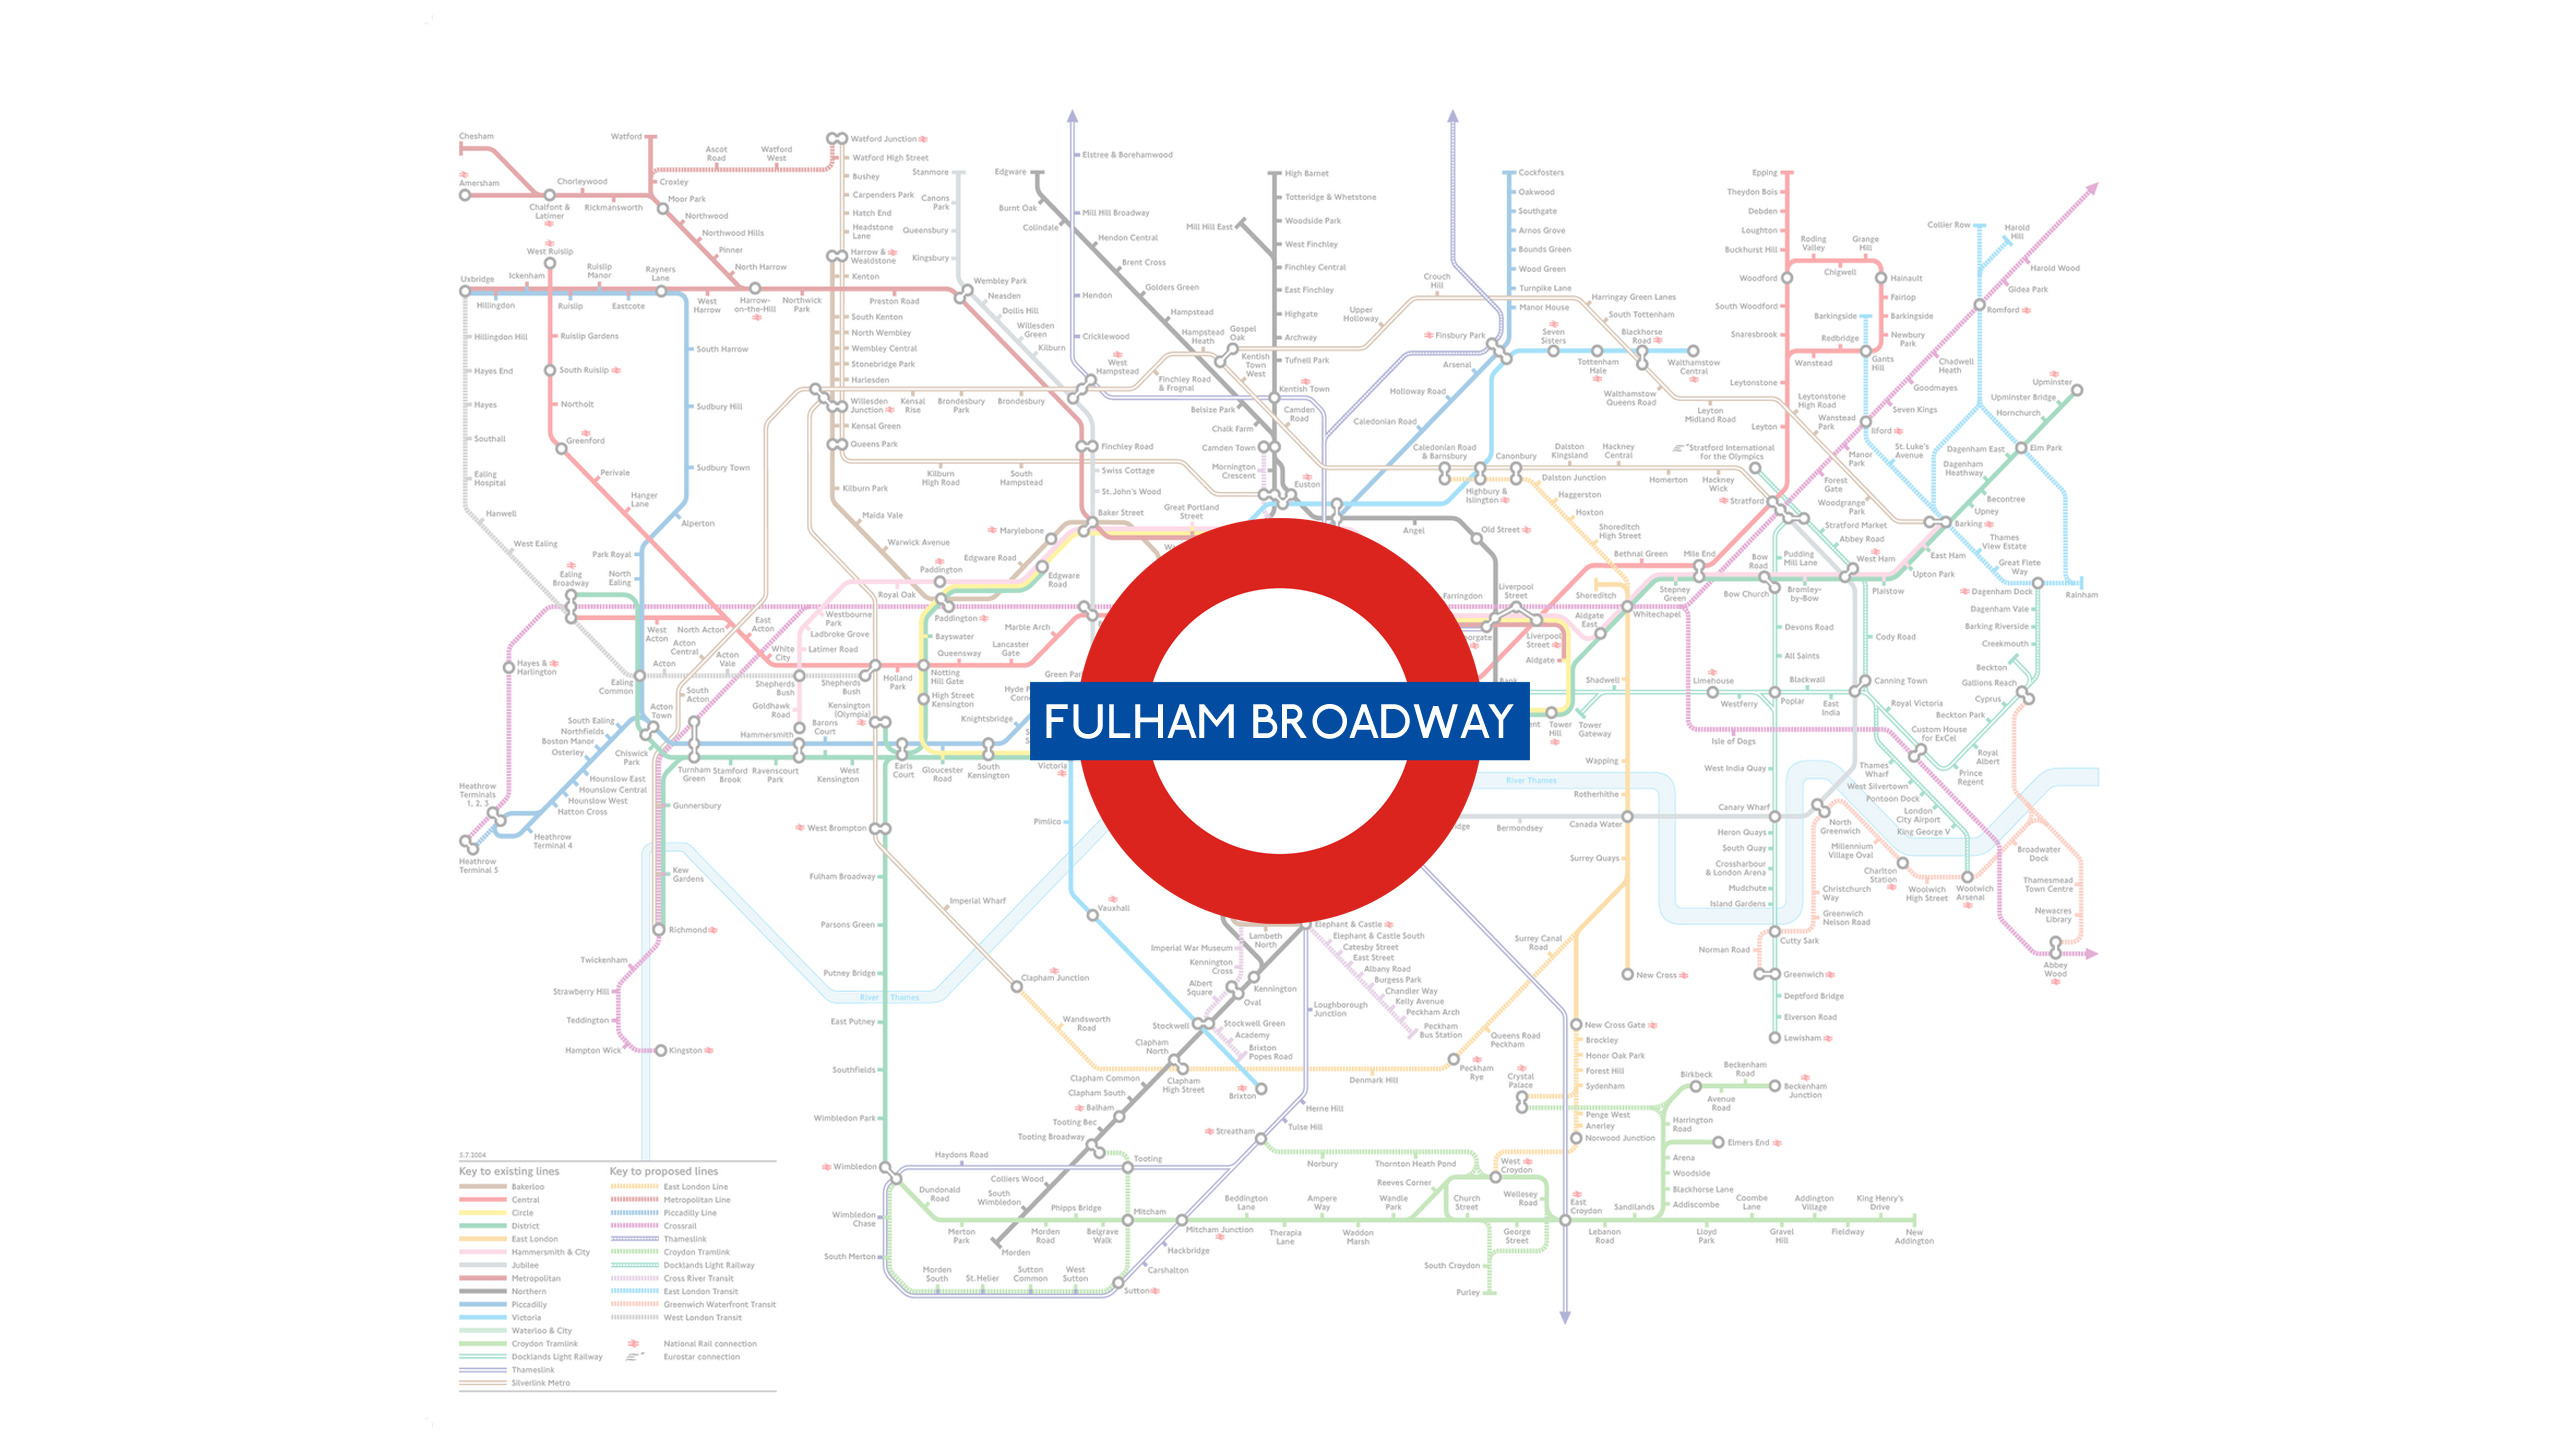 Fulham Broadway (Map)